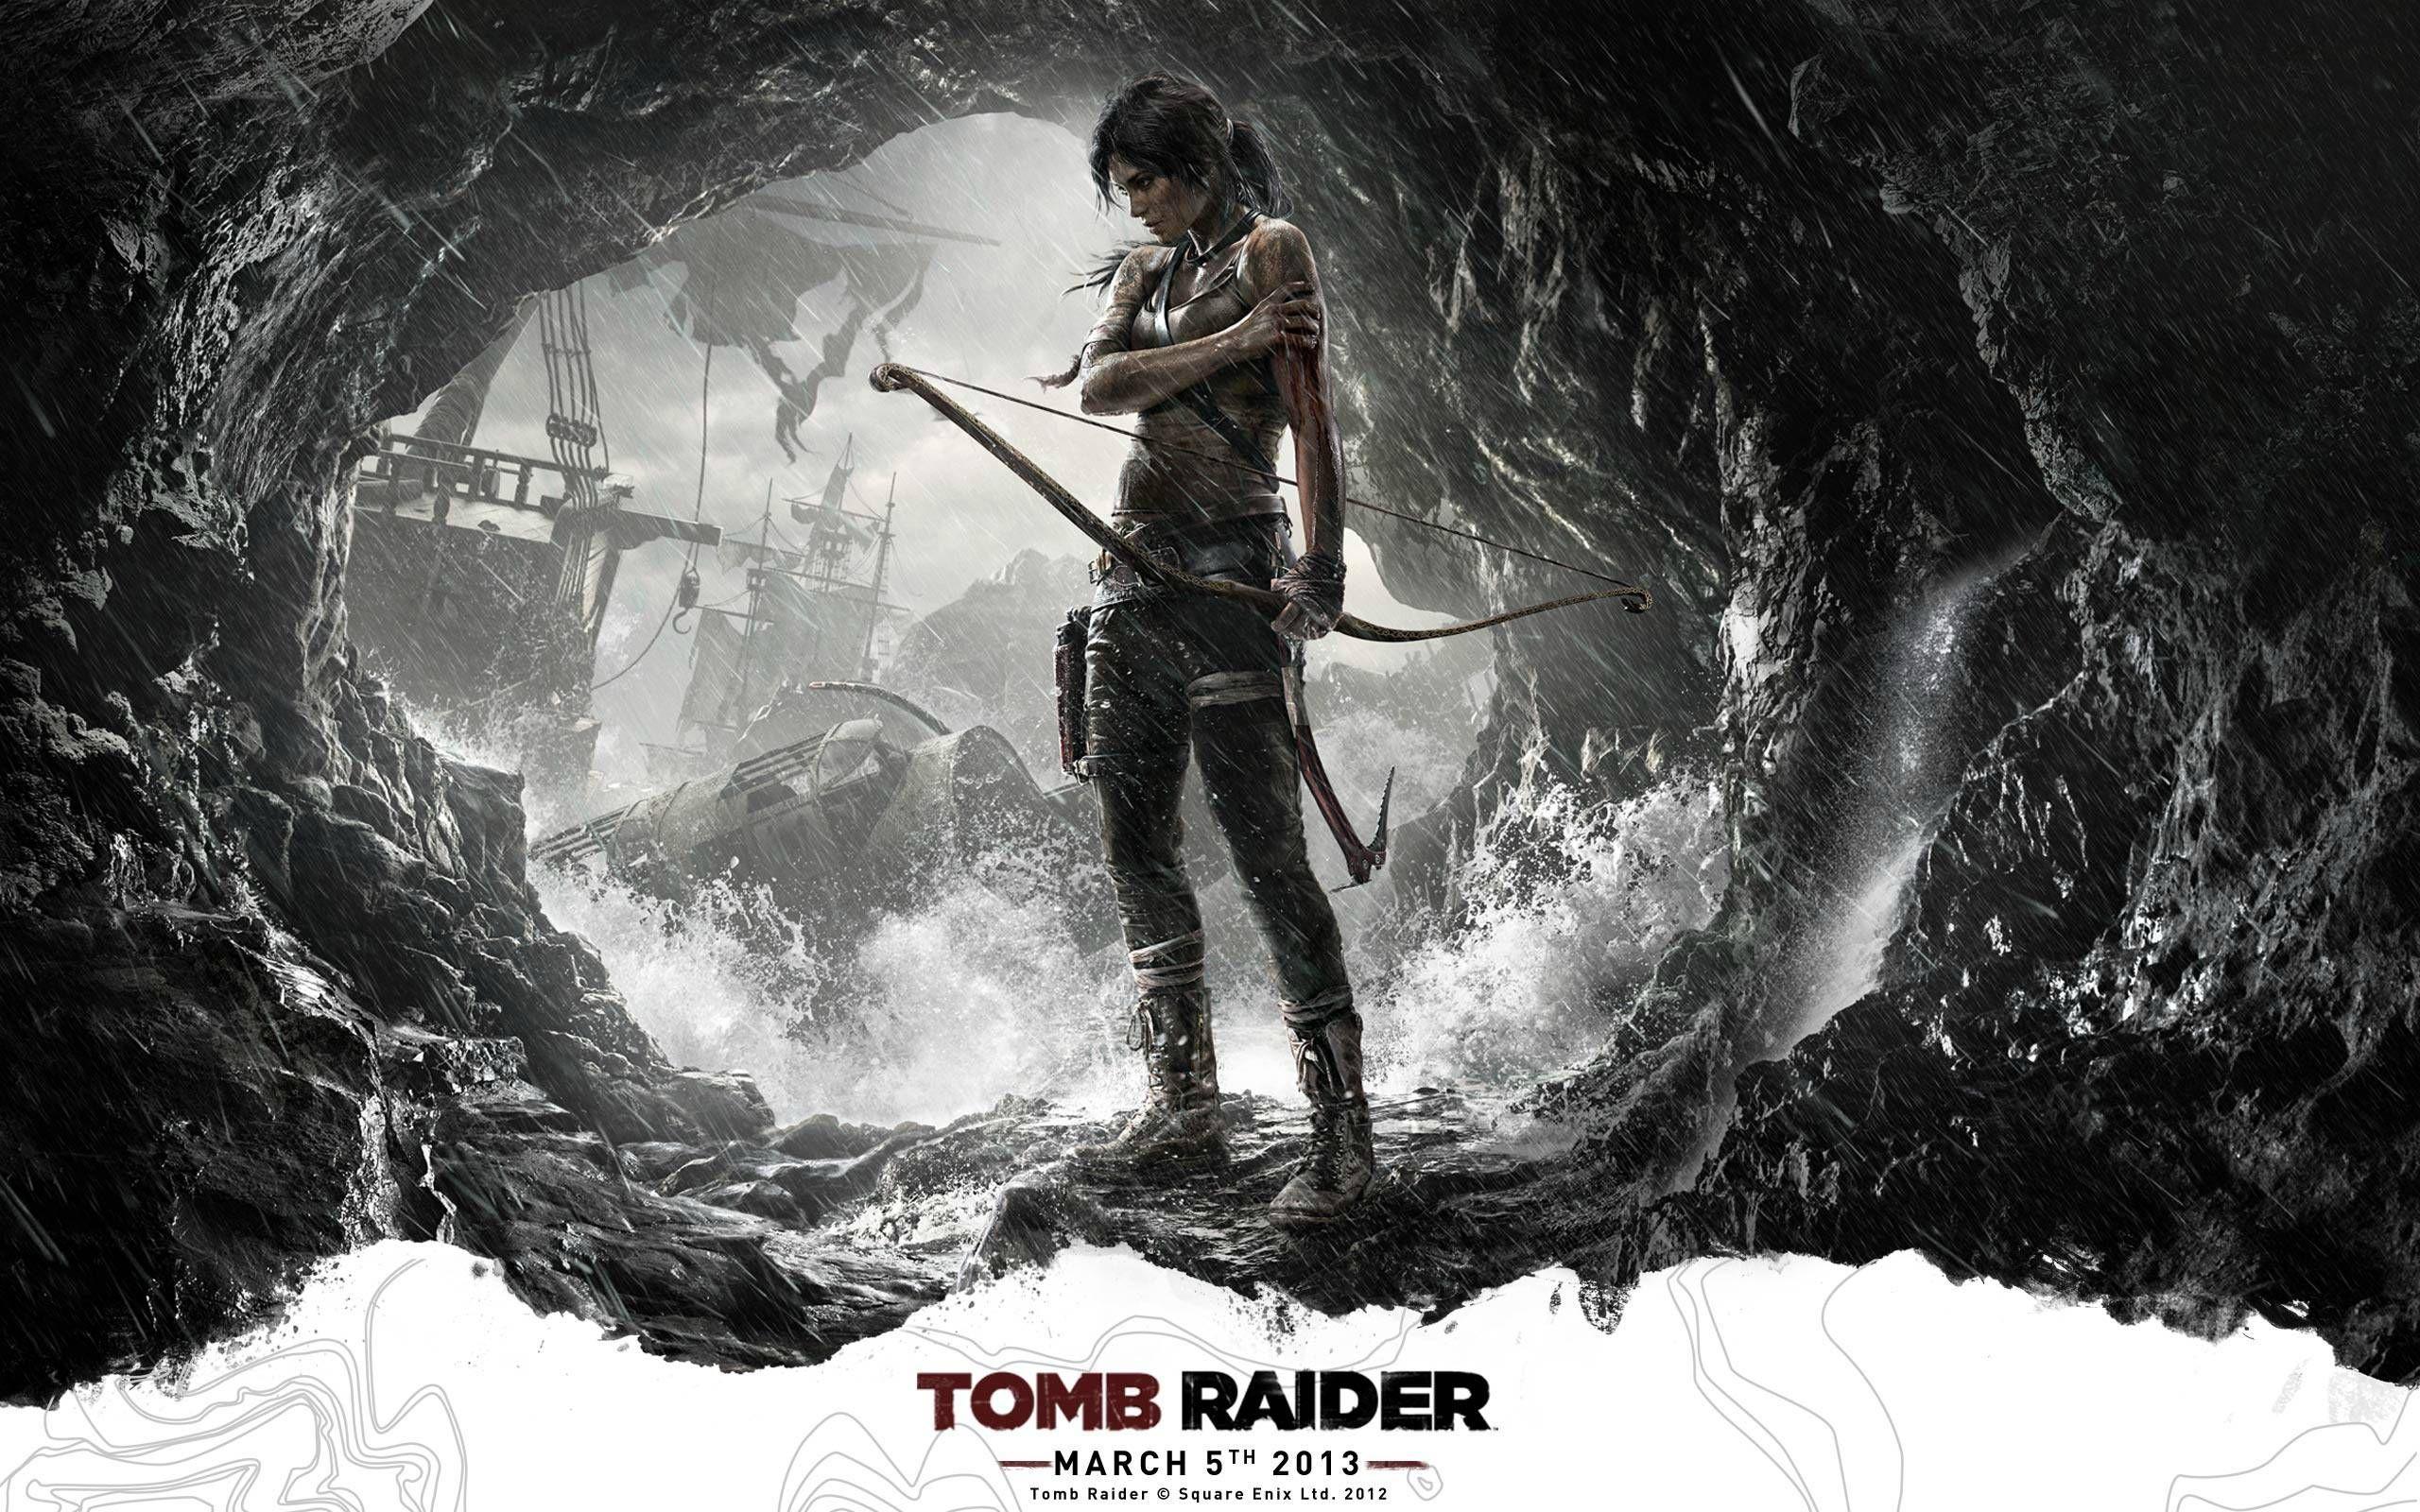 Tomb Raider Box Art Reveals A Vulnerable Yet Strong Lara Croft